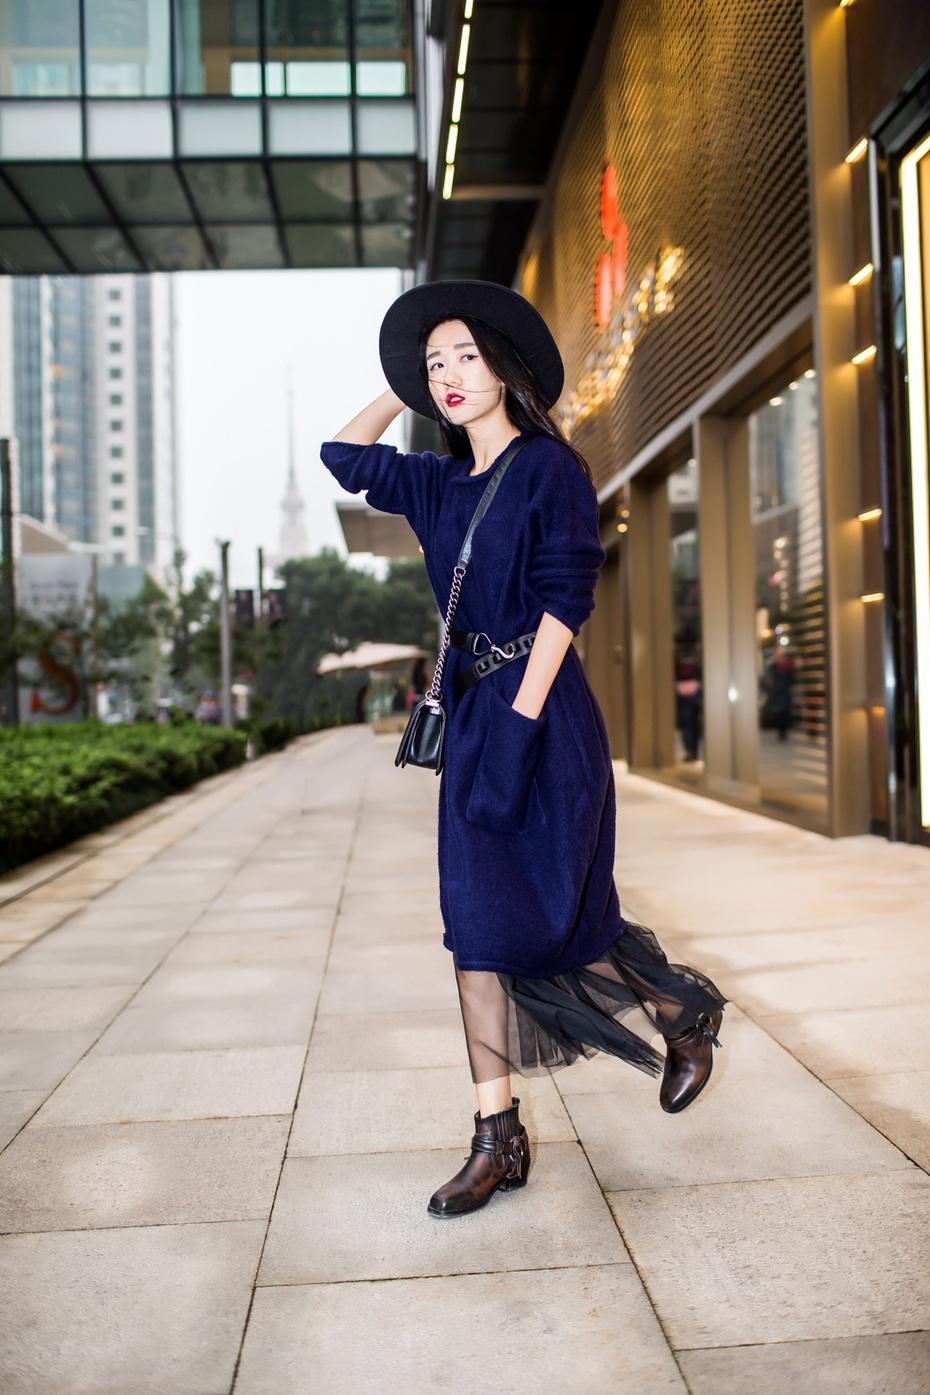 [Ava搭配日记]—— 寒风凛冽,不减姿态 - AvaFoo - Avas Fashion Blog